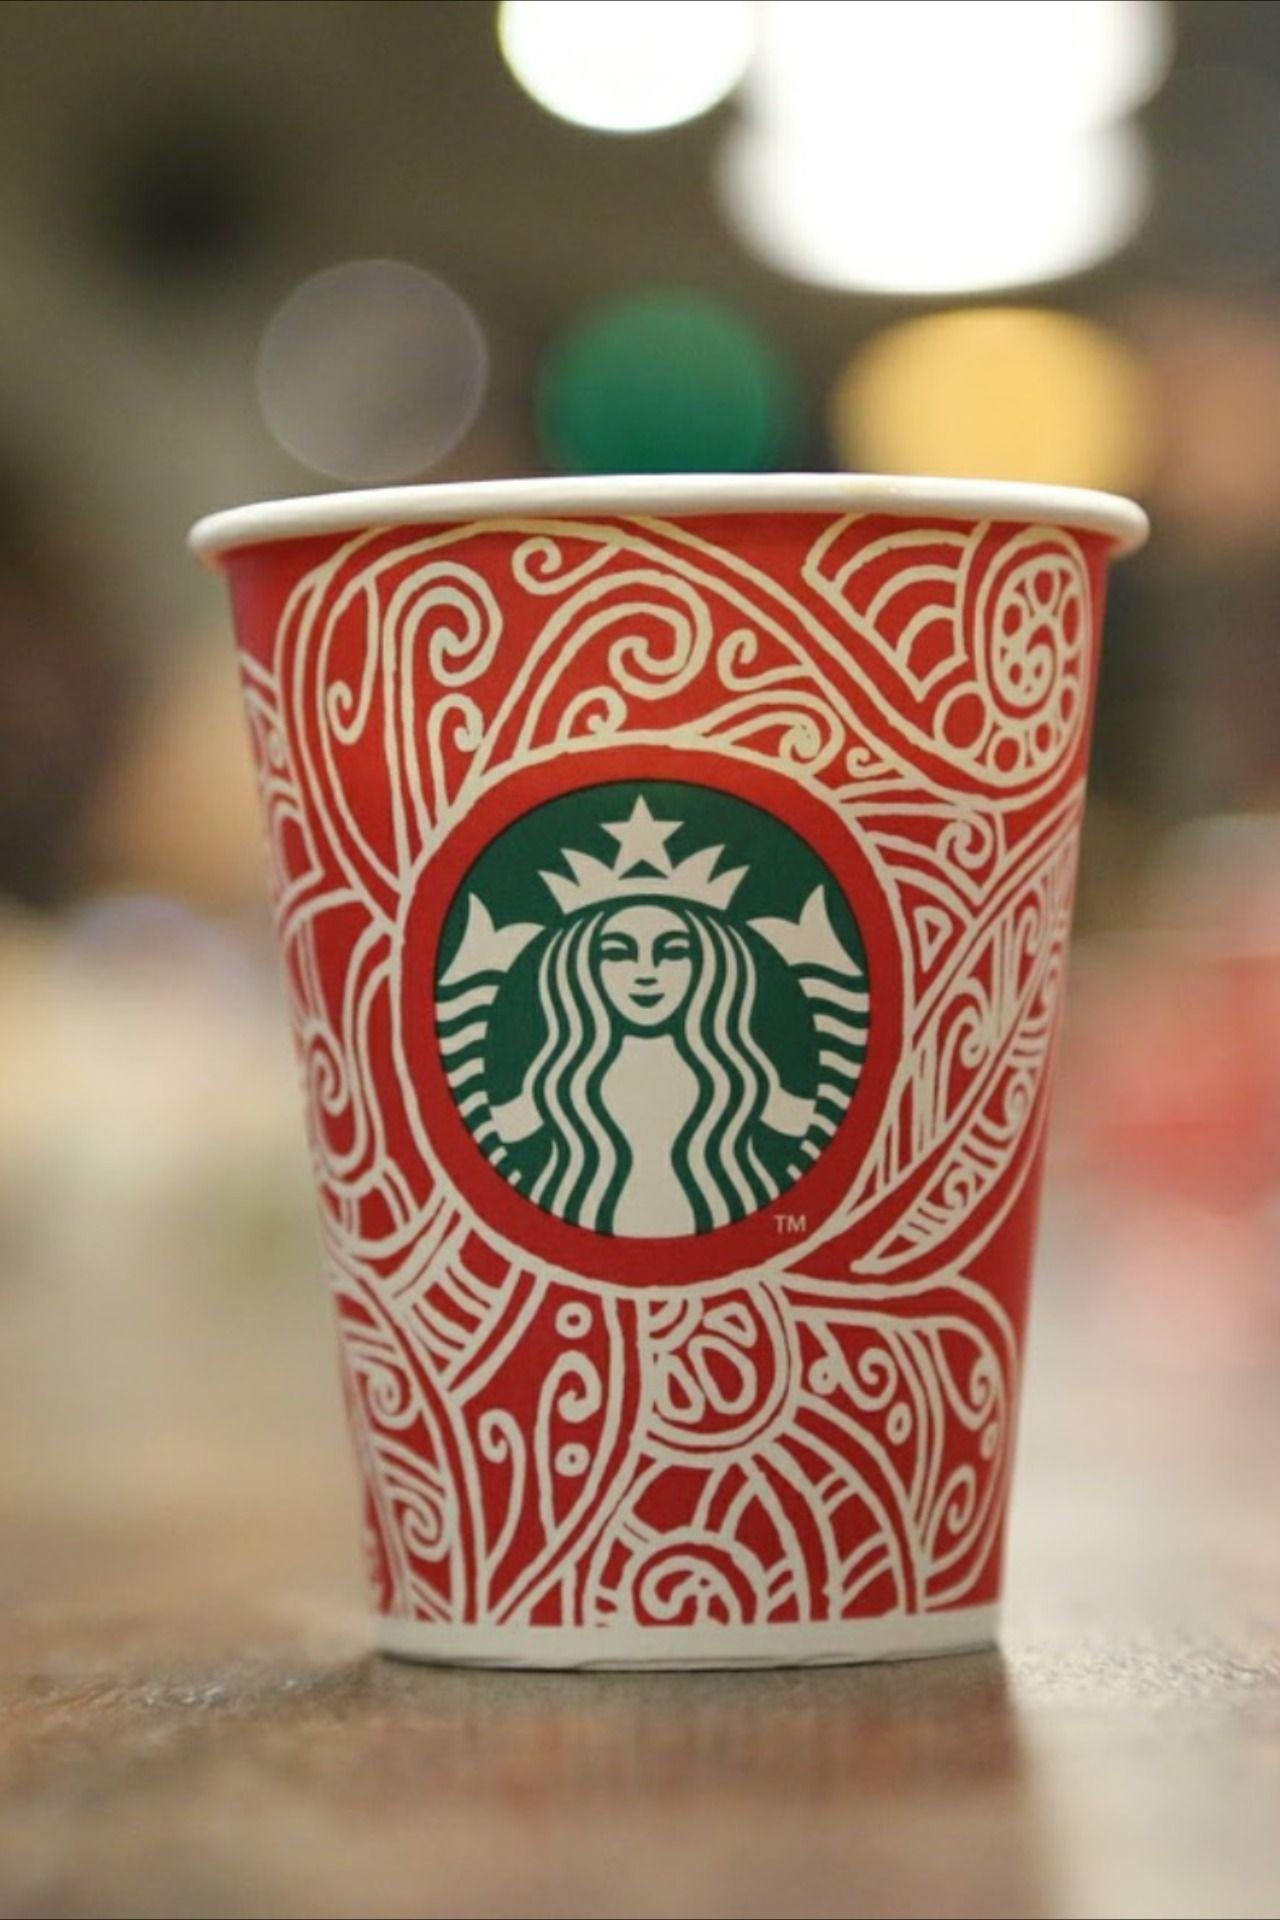 Starbucks drinks Starbucks secret menu Starbucks